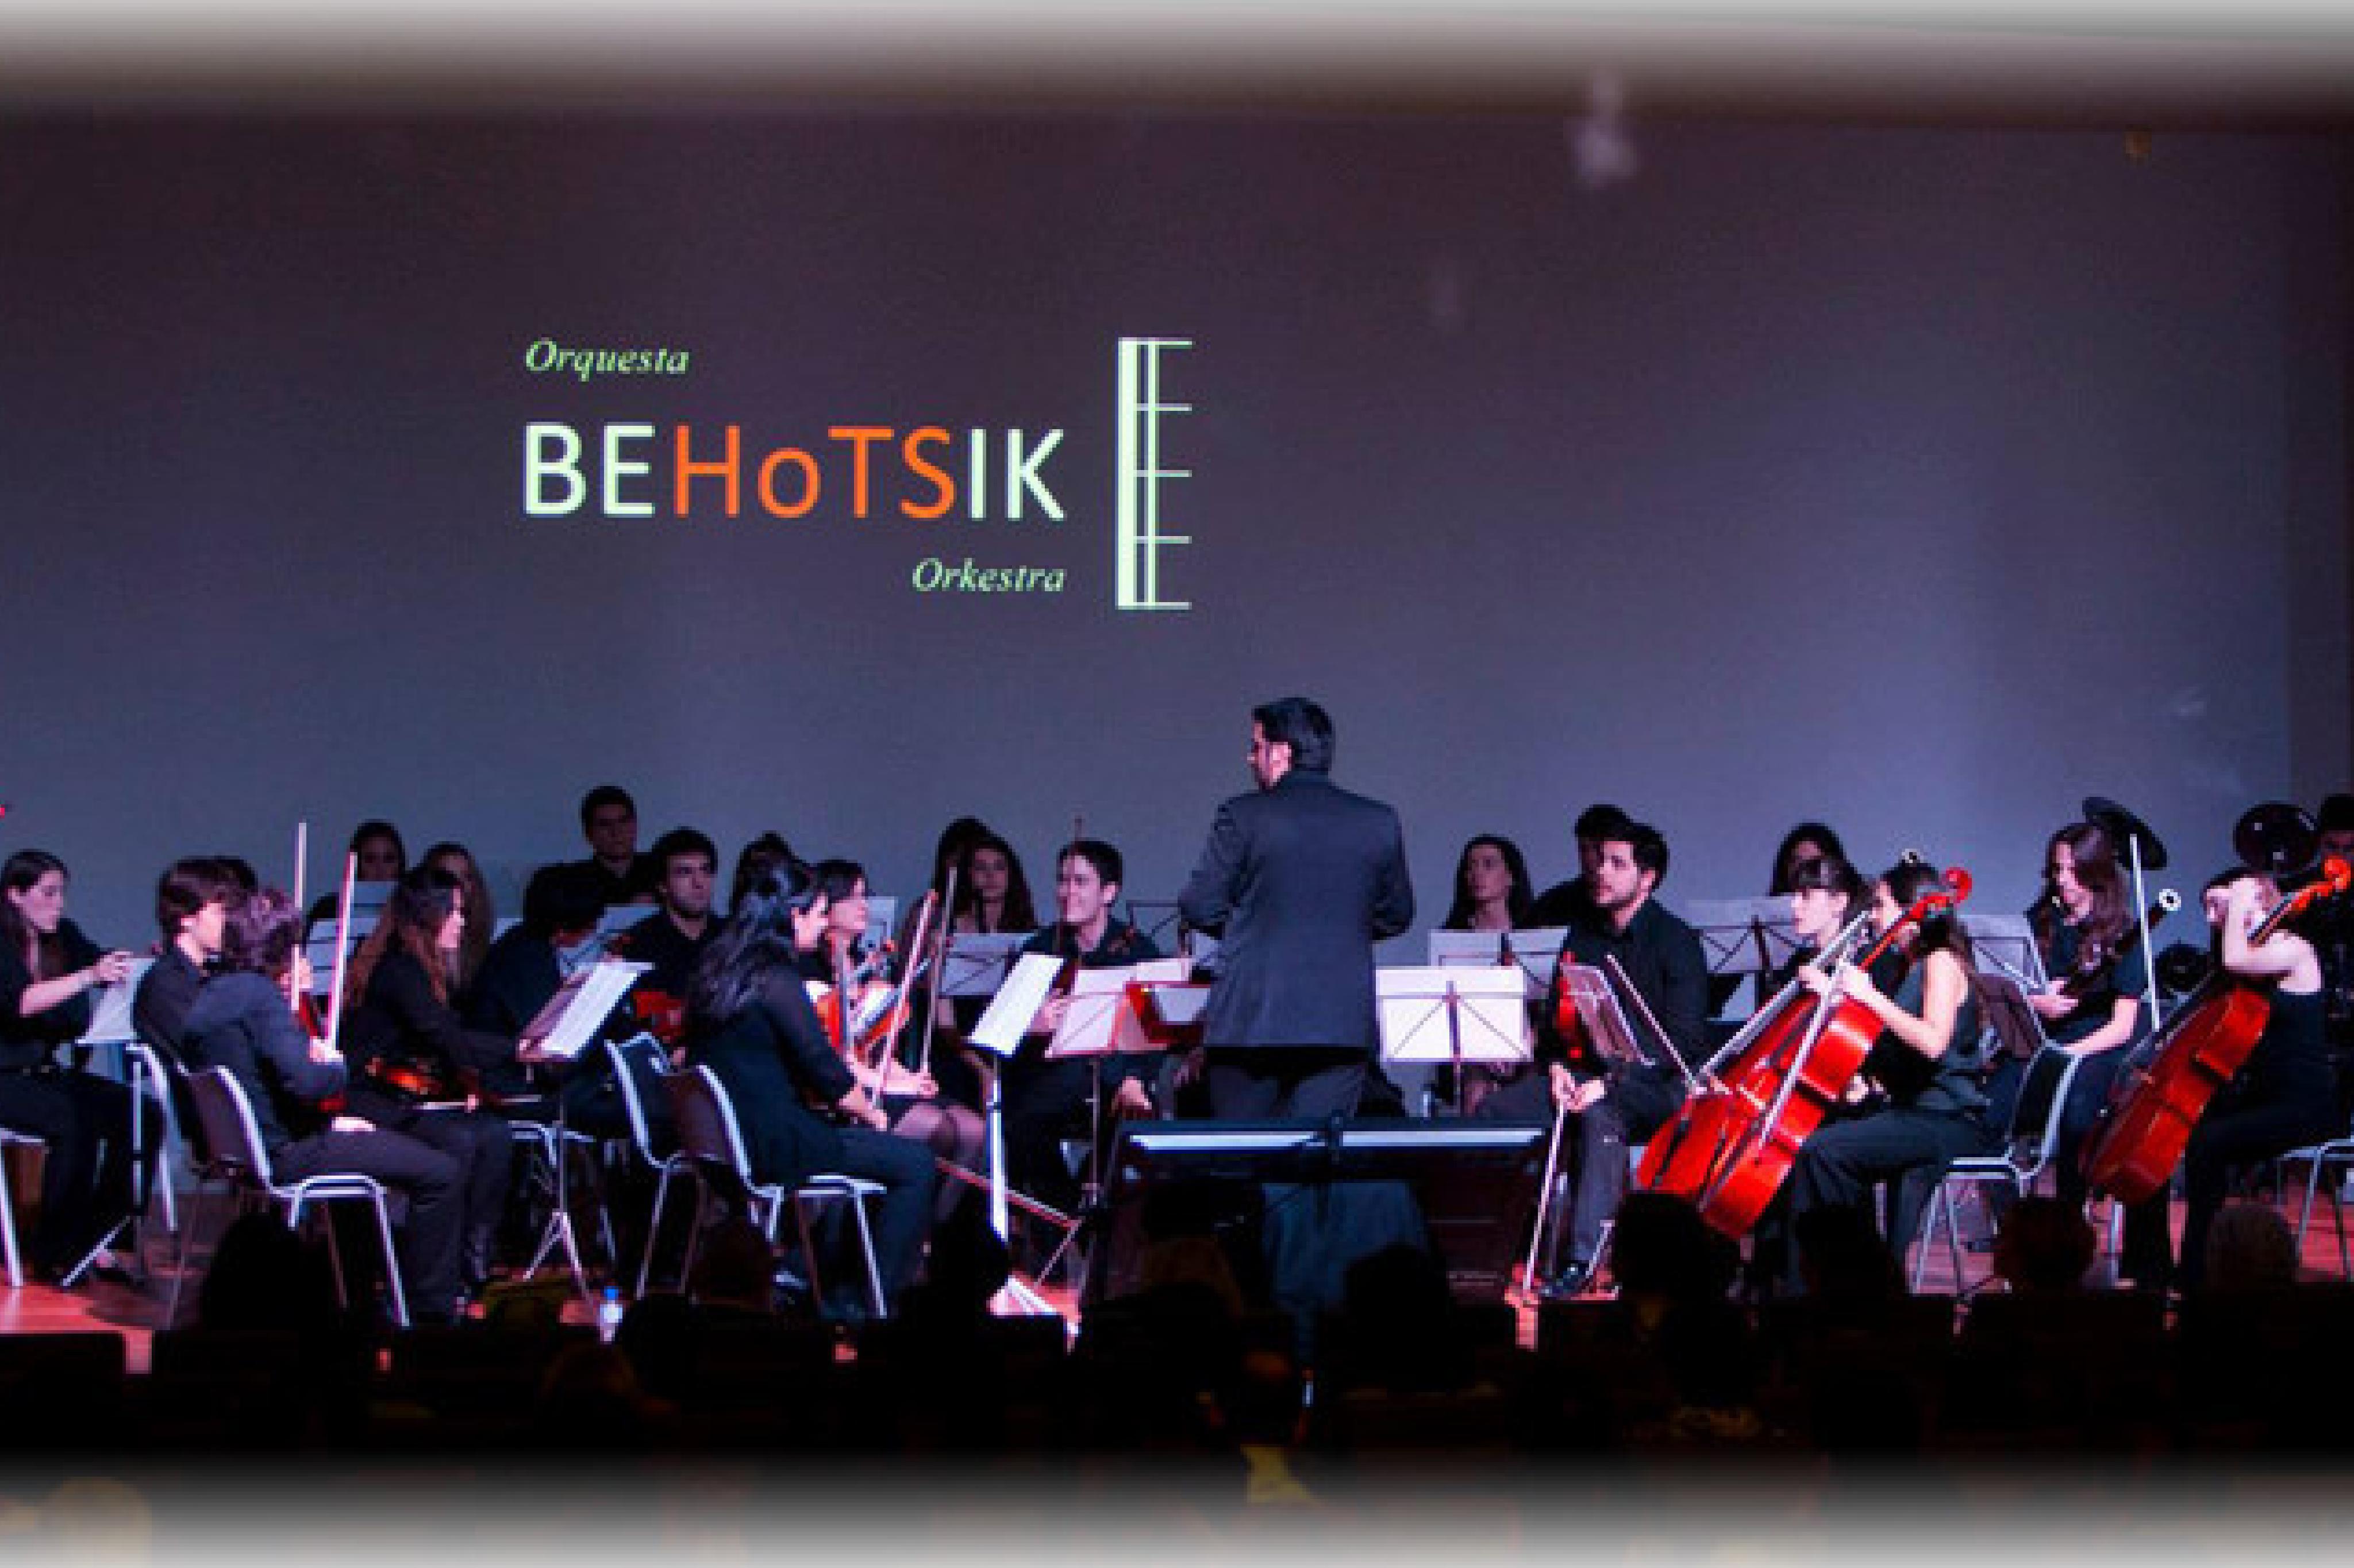 Bilbao2014 - behotsikB